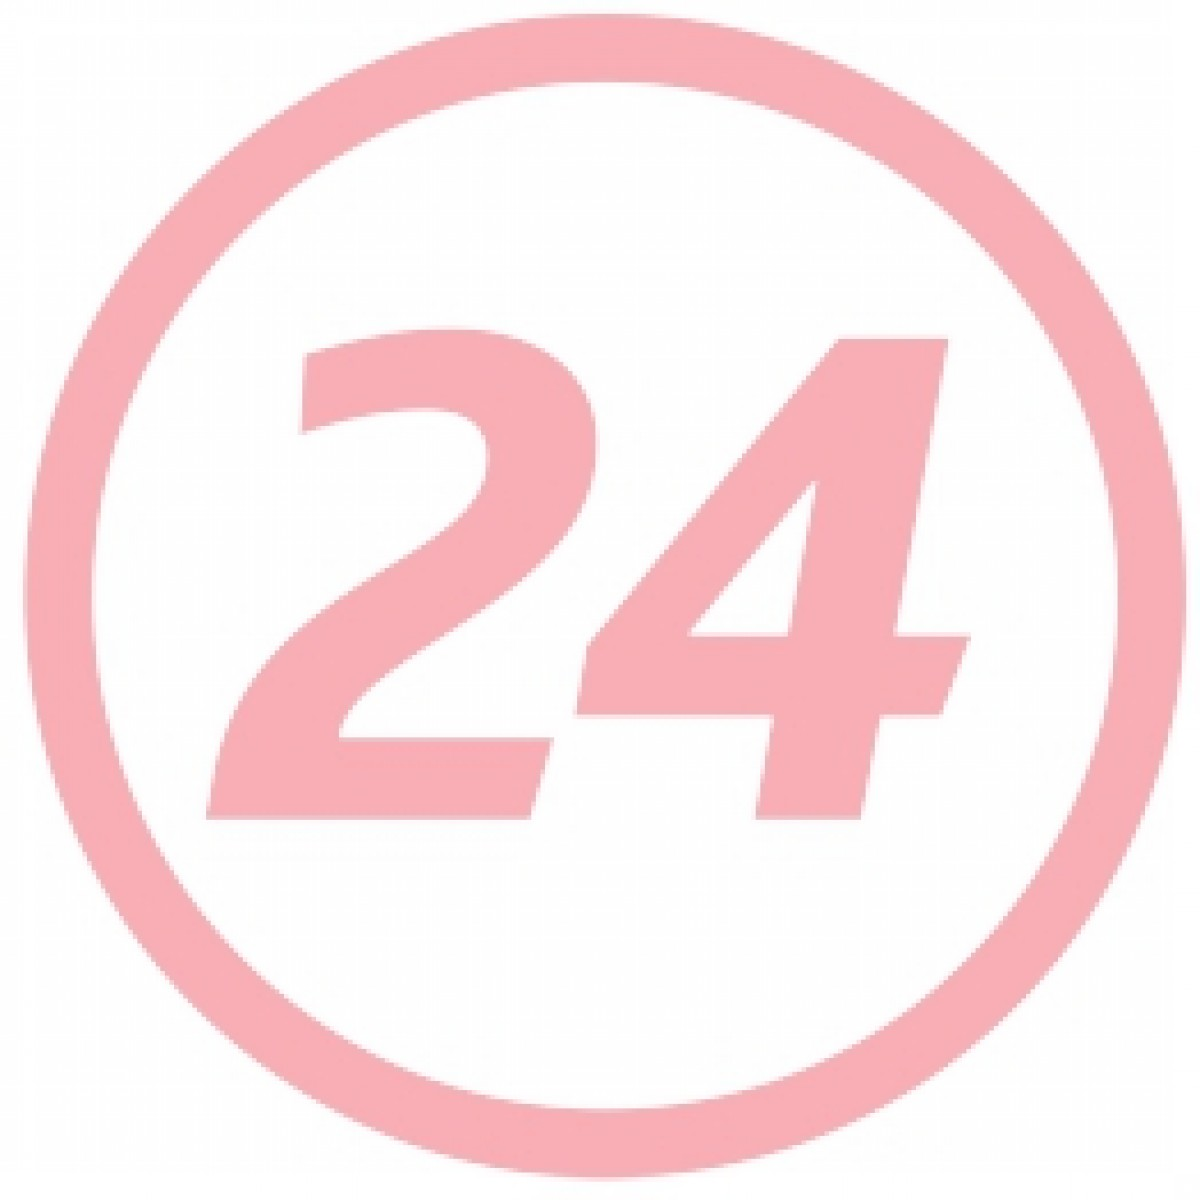 HARTMANN Peha-Crepp Fasa Elastica Pentru Fixare Pansamentelor 8cm x 4m, Fasa, 1buc